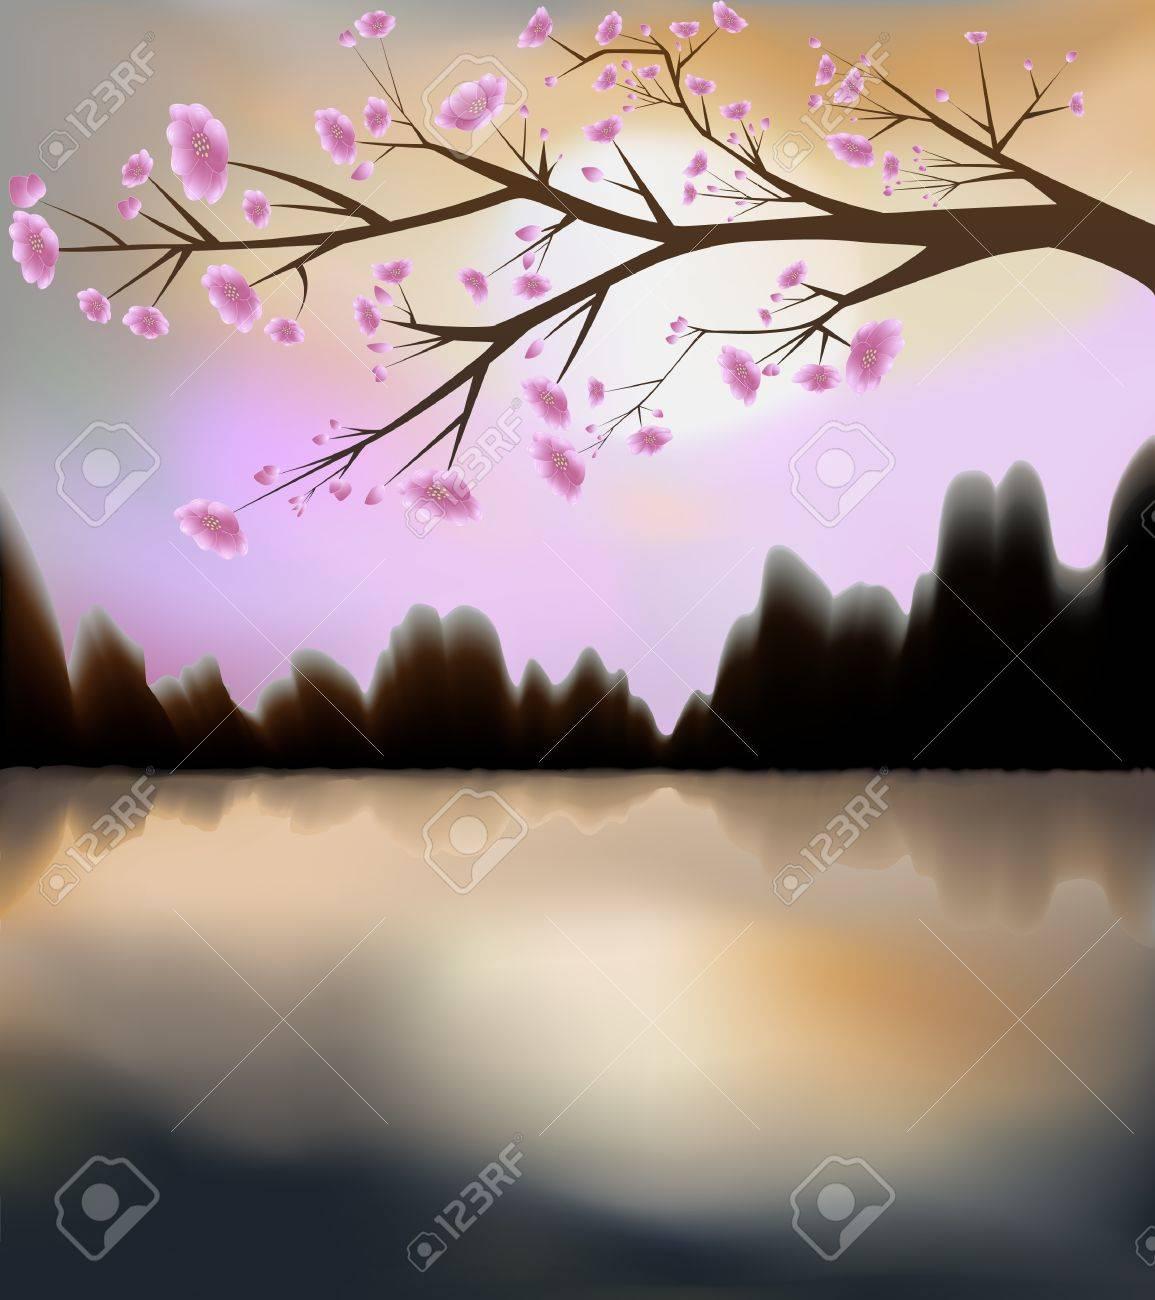 Illustration of sunset and sakura in bloom Stock Vector - 9622305